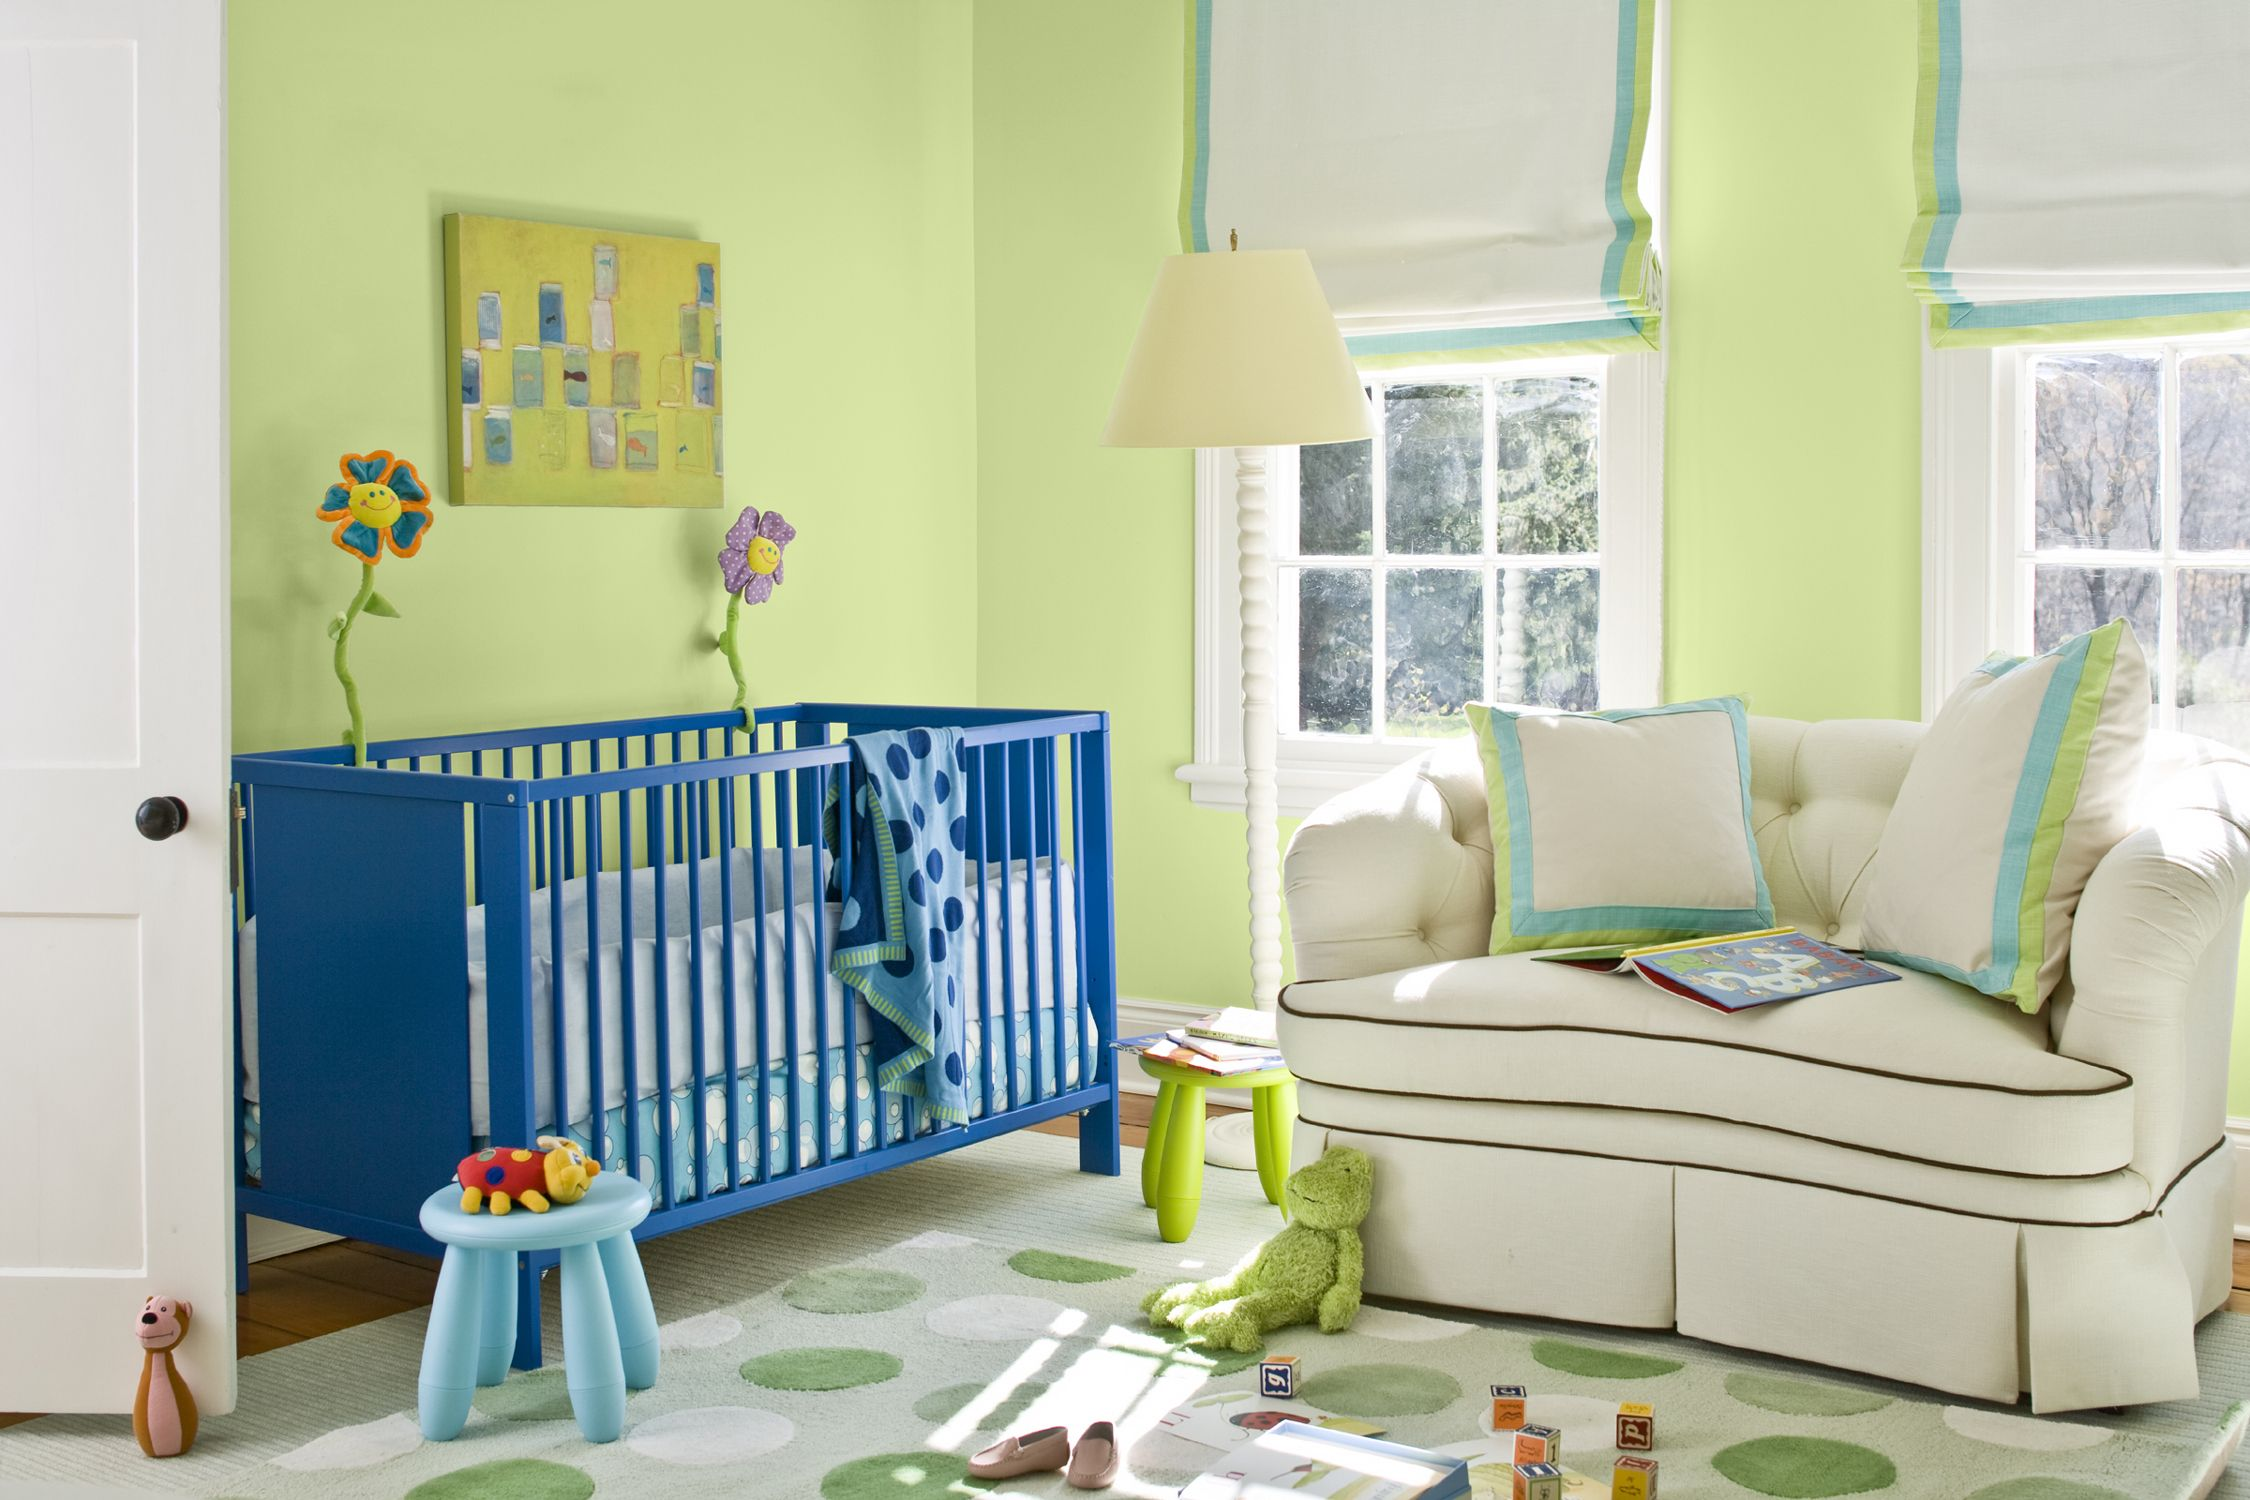 benjamin moore key lime 231-50   paint colors   pinterest